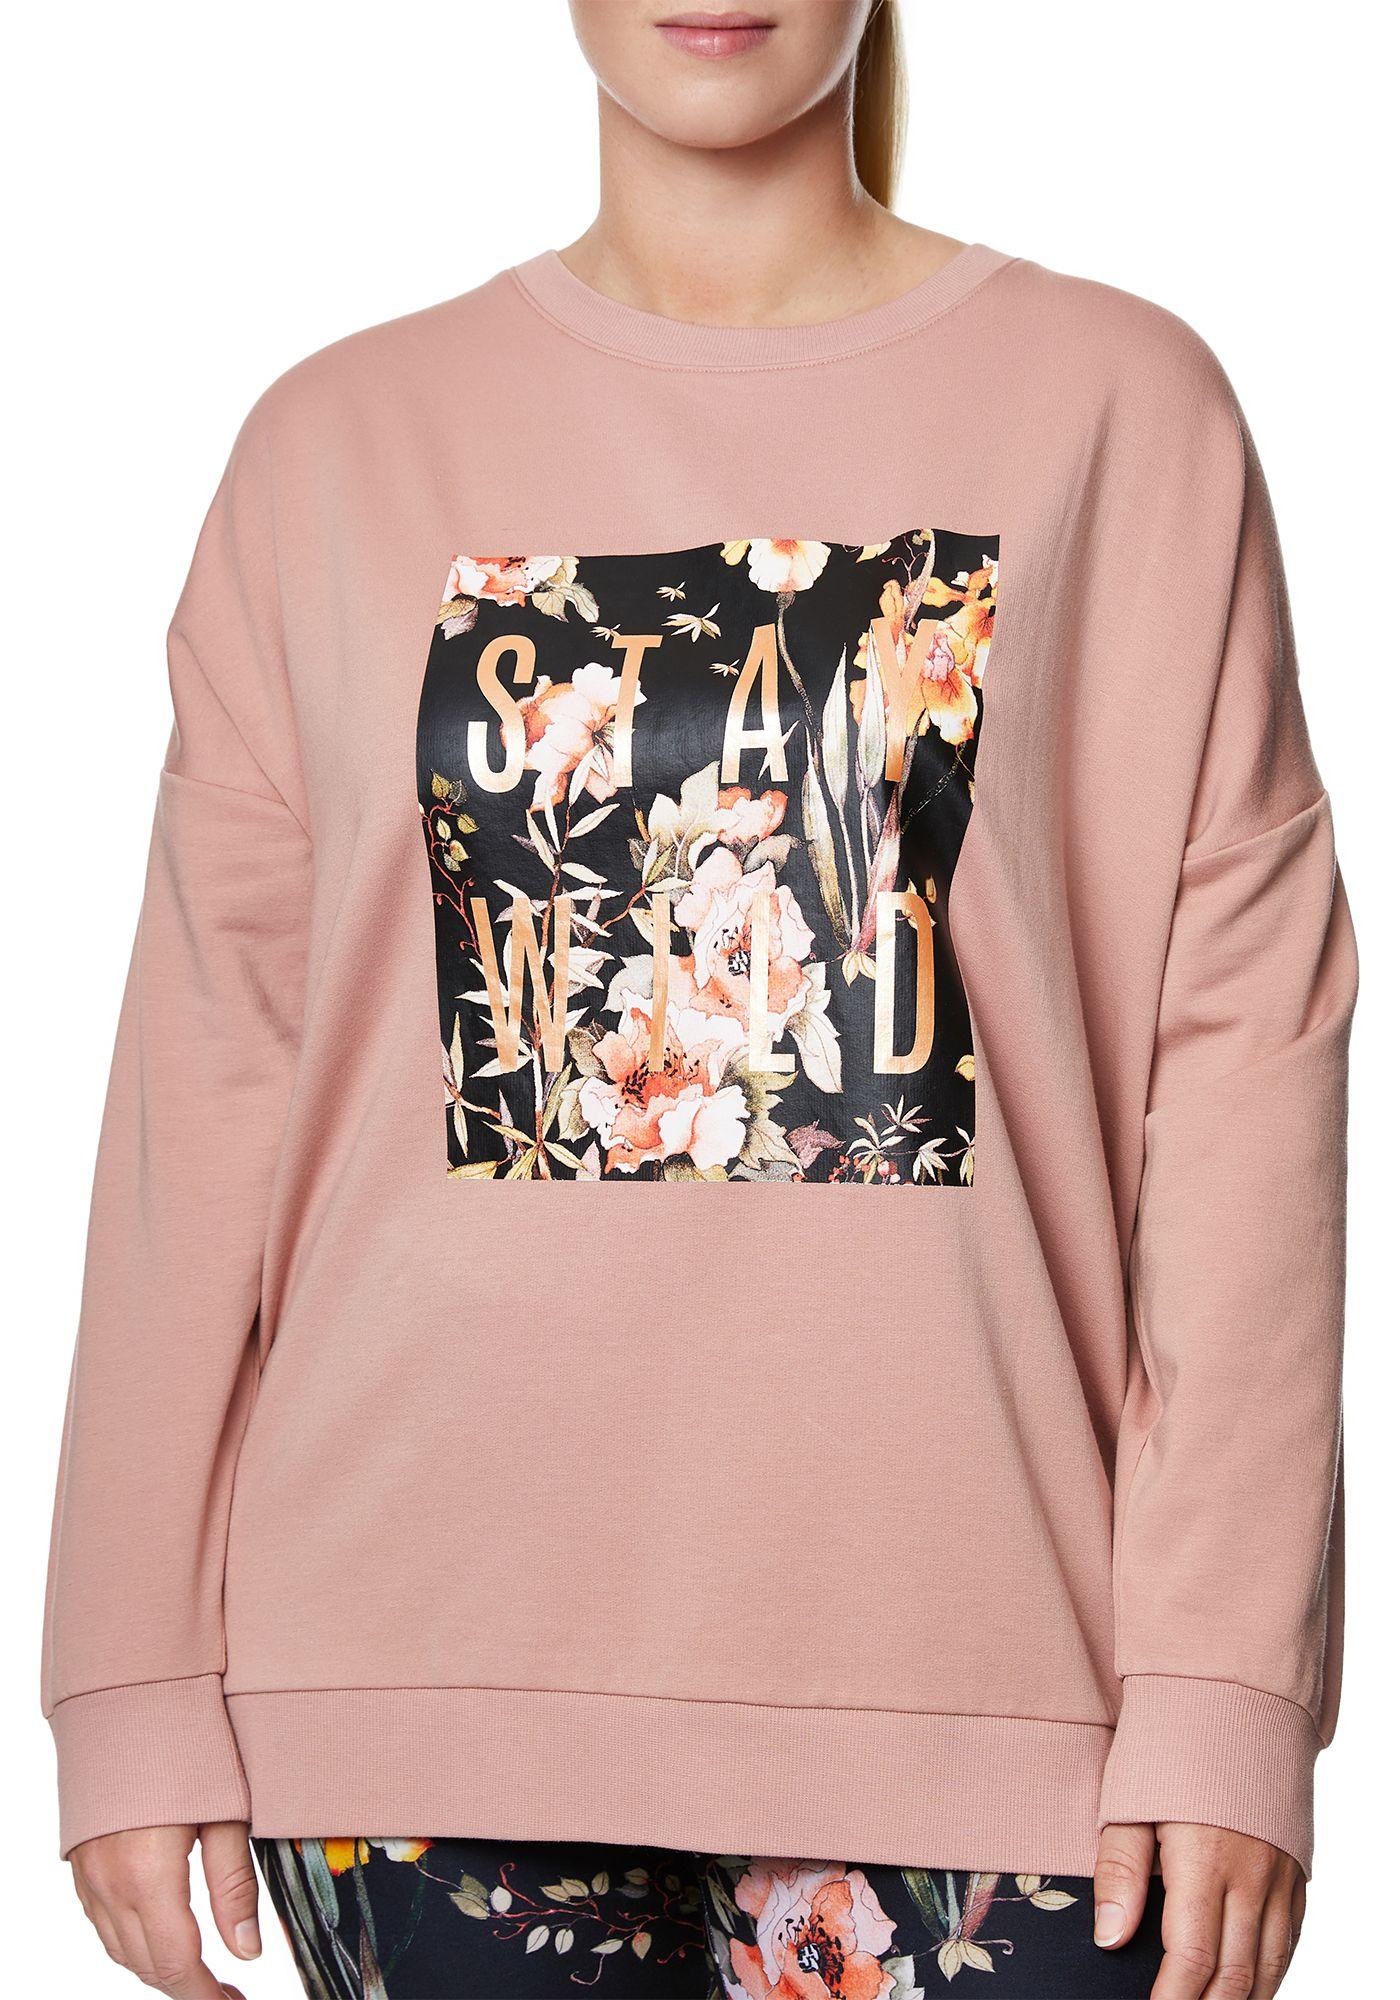 Betsey Johnson Women's Plus Size Stay Wild Graphic Sweatshirt